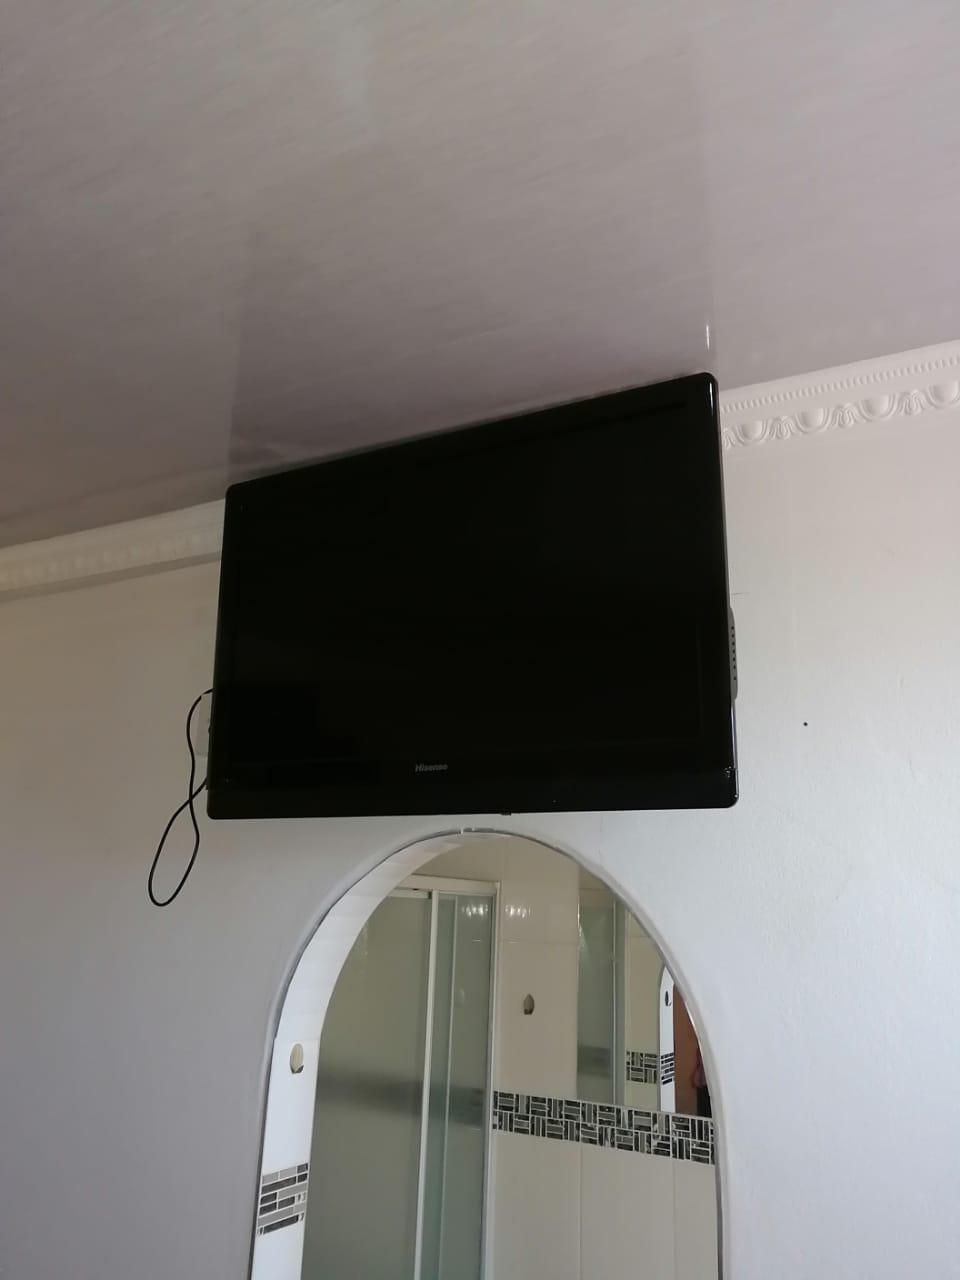 36 inch hisense Tv R5000